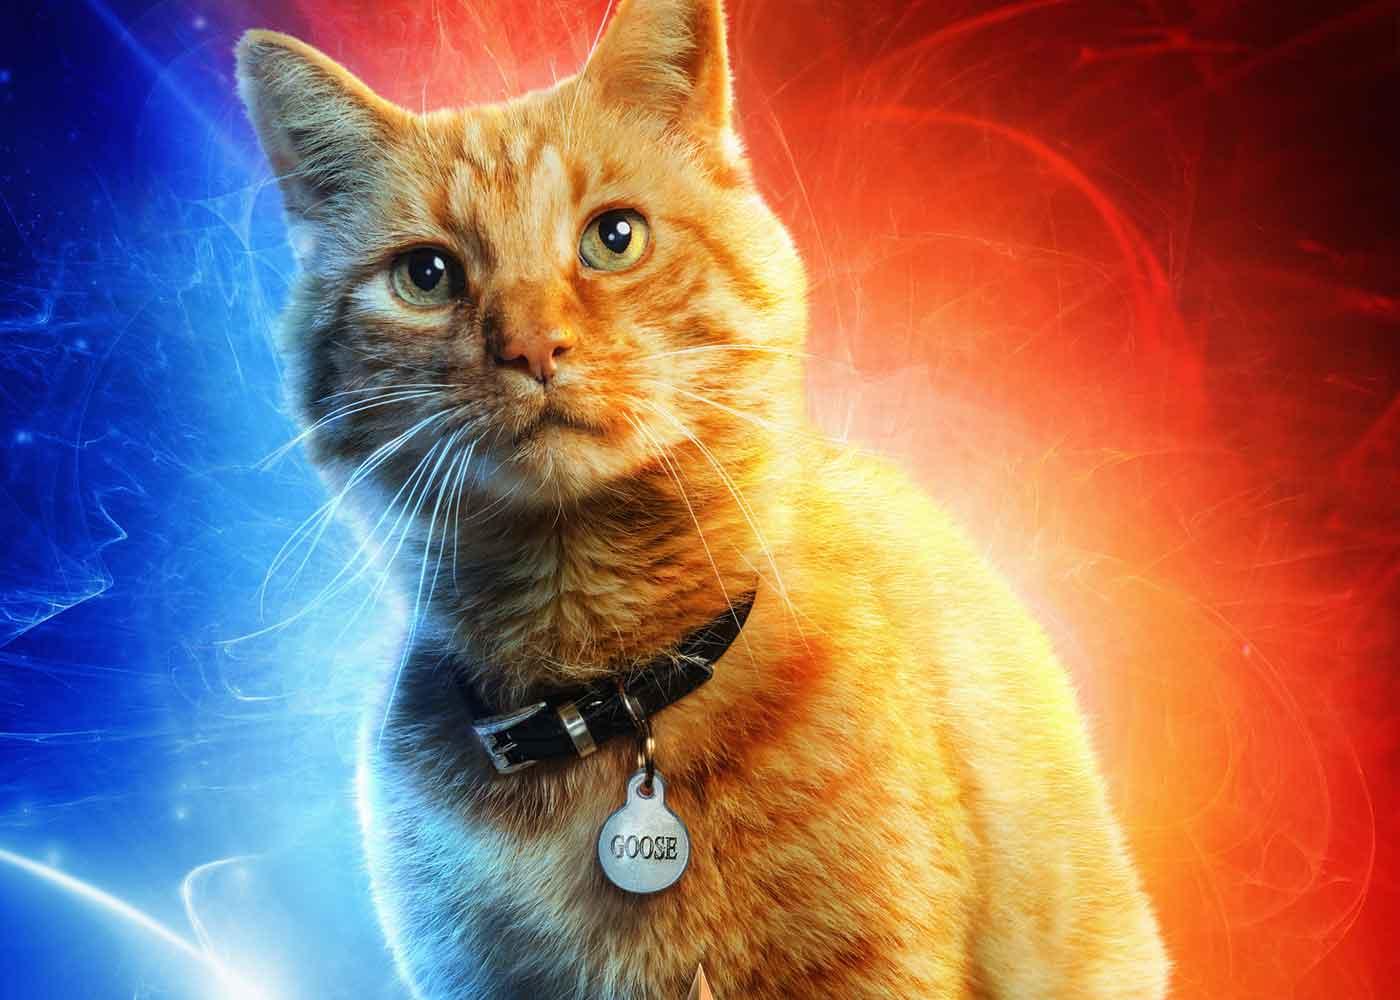 Nama Kucing Yang Berwarna Oren 81021 Nama Untuk Kucing Comel Lucu Dan Unik